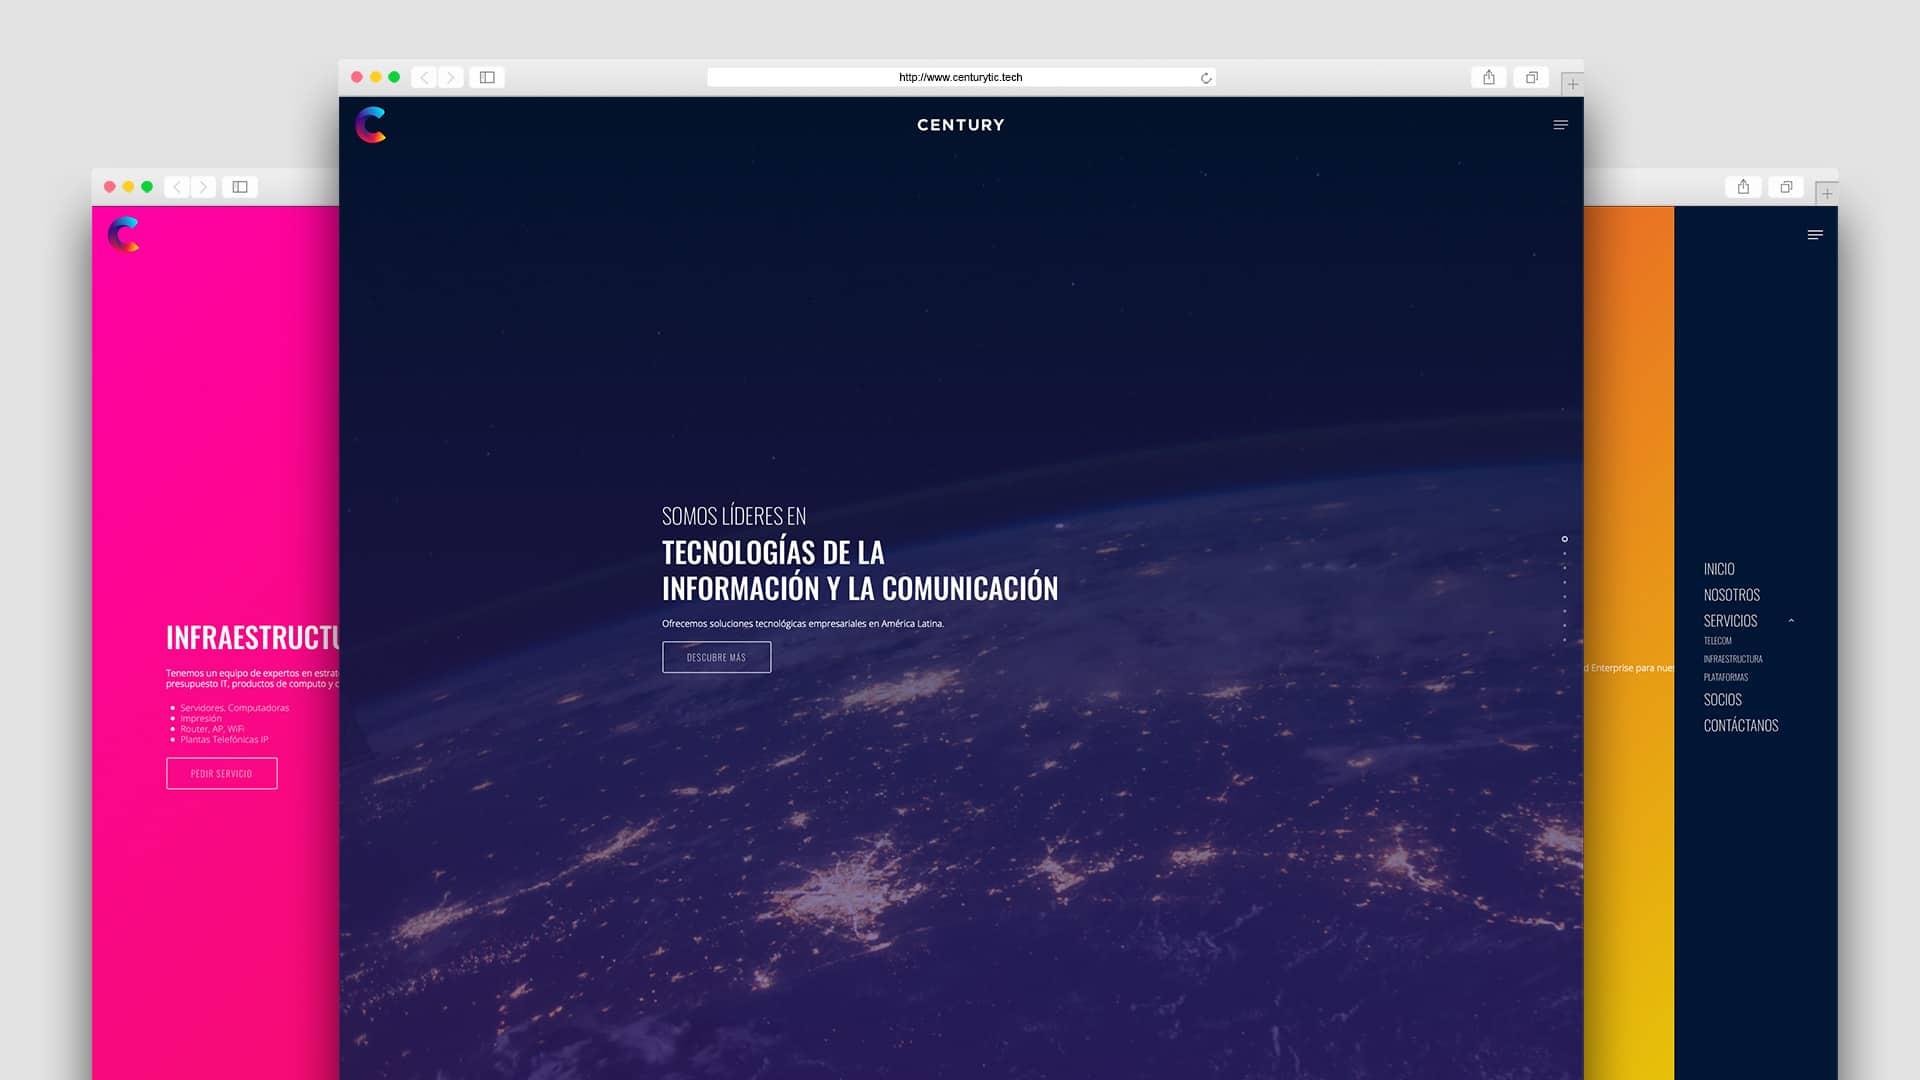 fitosophy-century-website